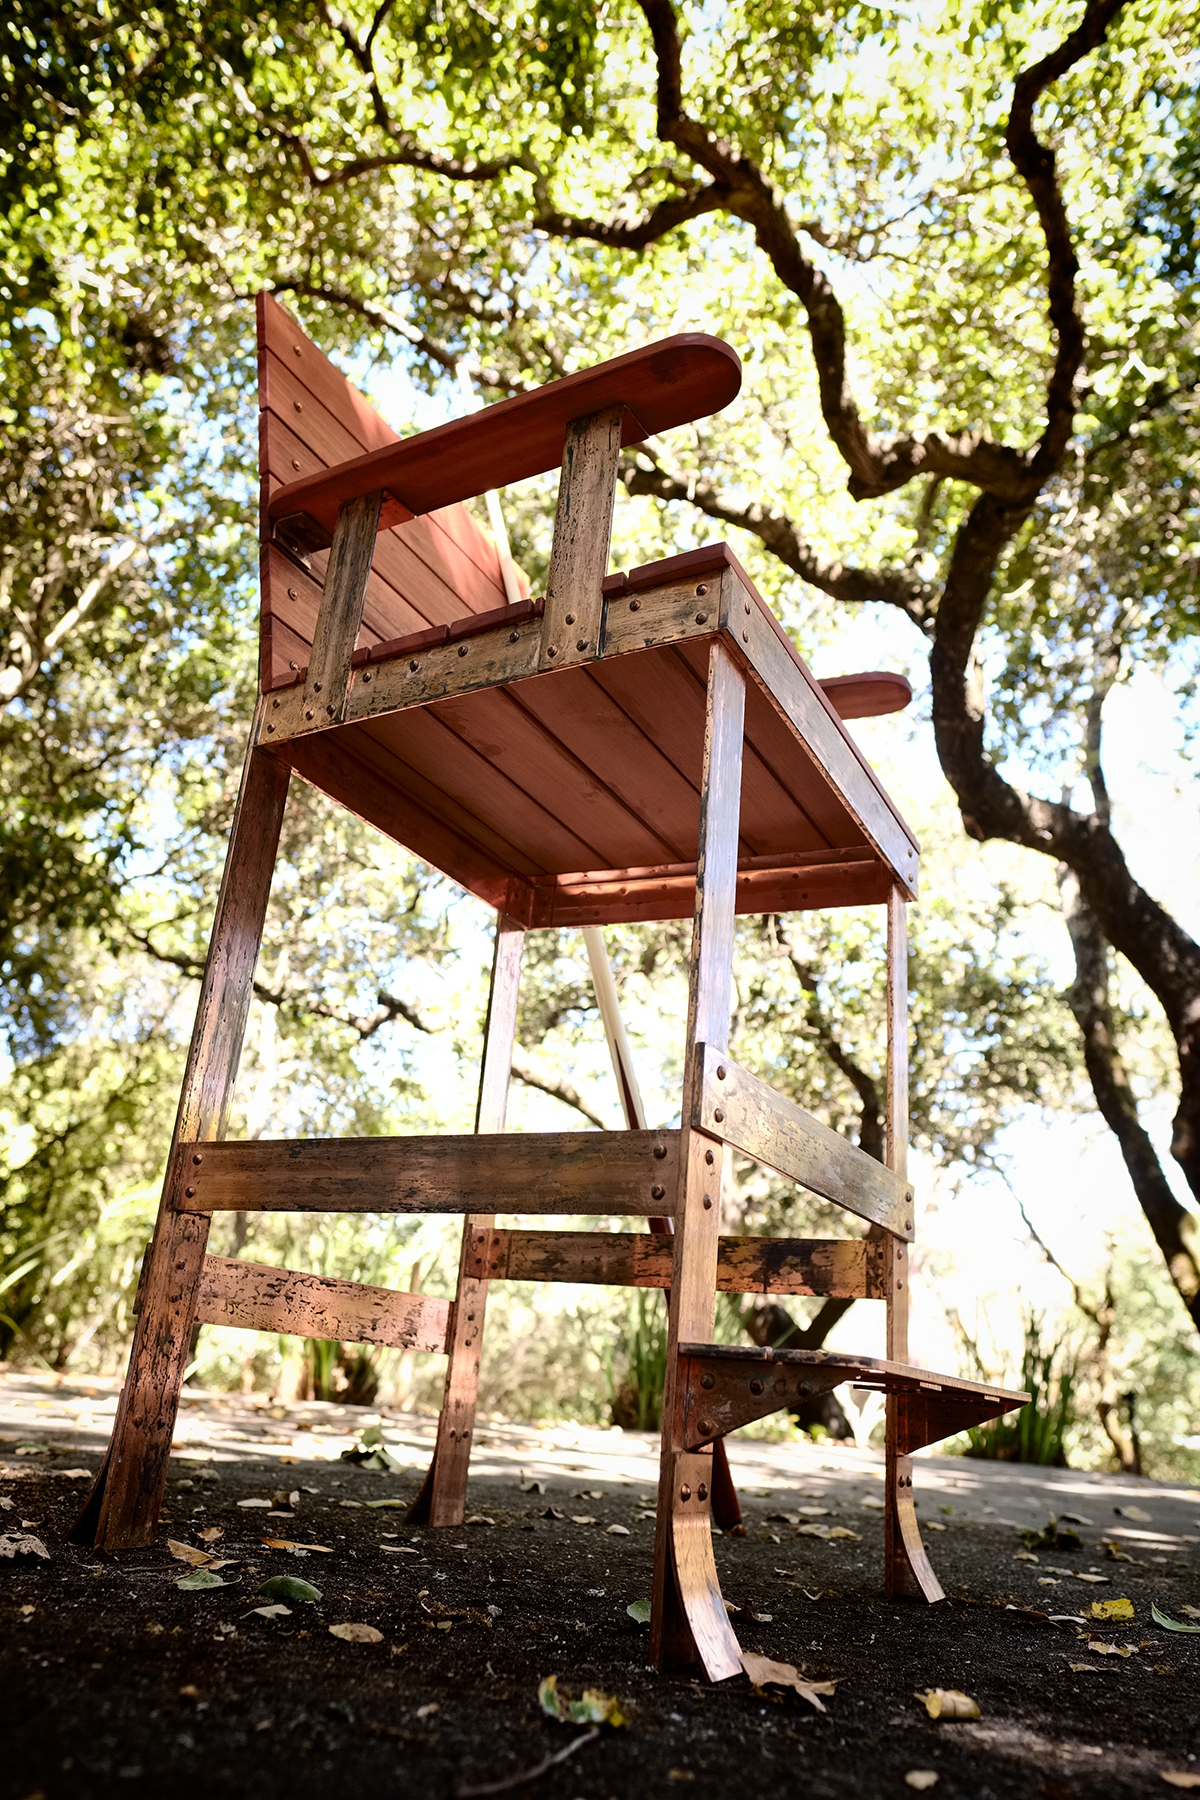 copper-hutch-chair